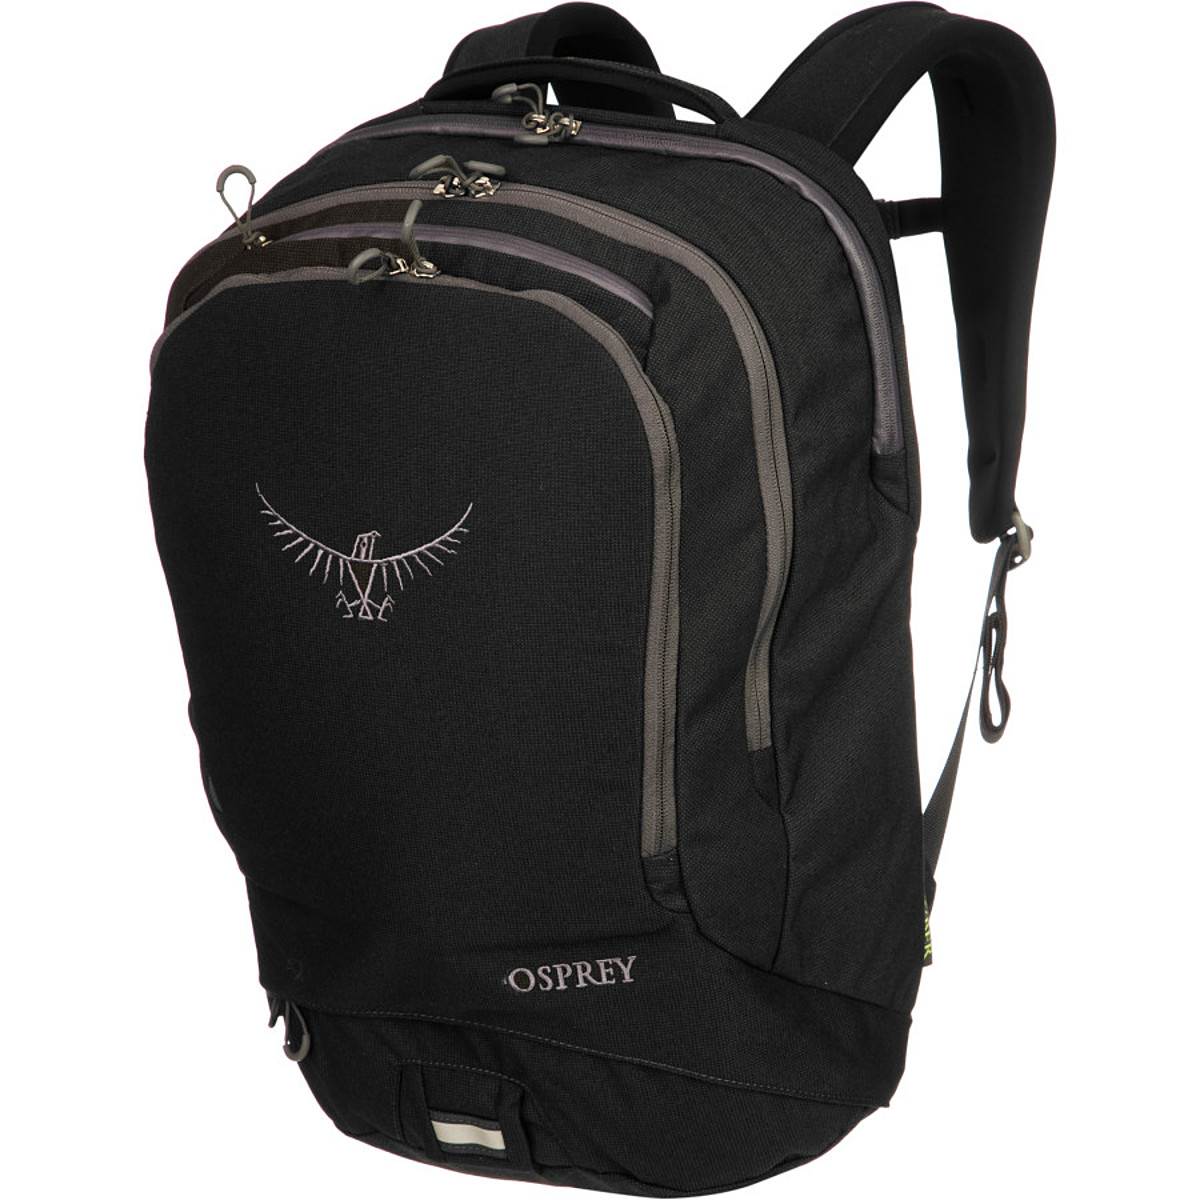 Osprey Cyber